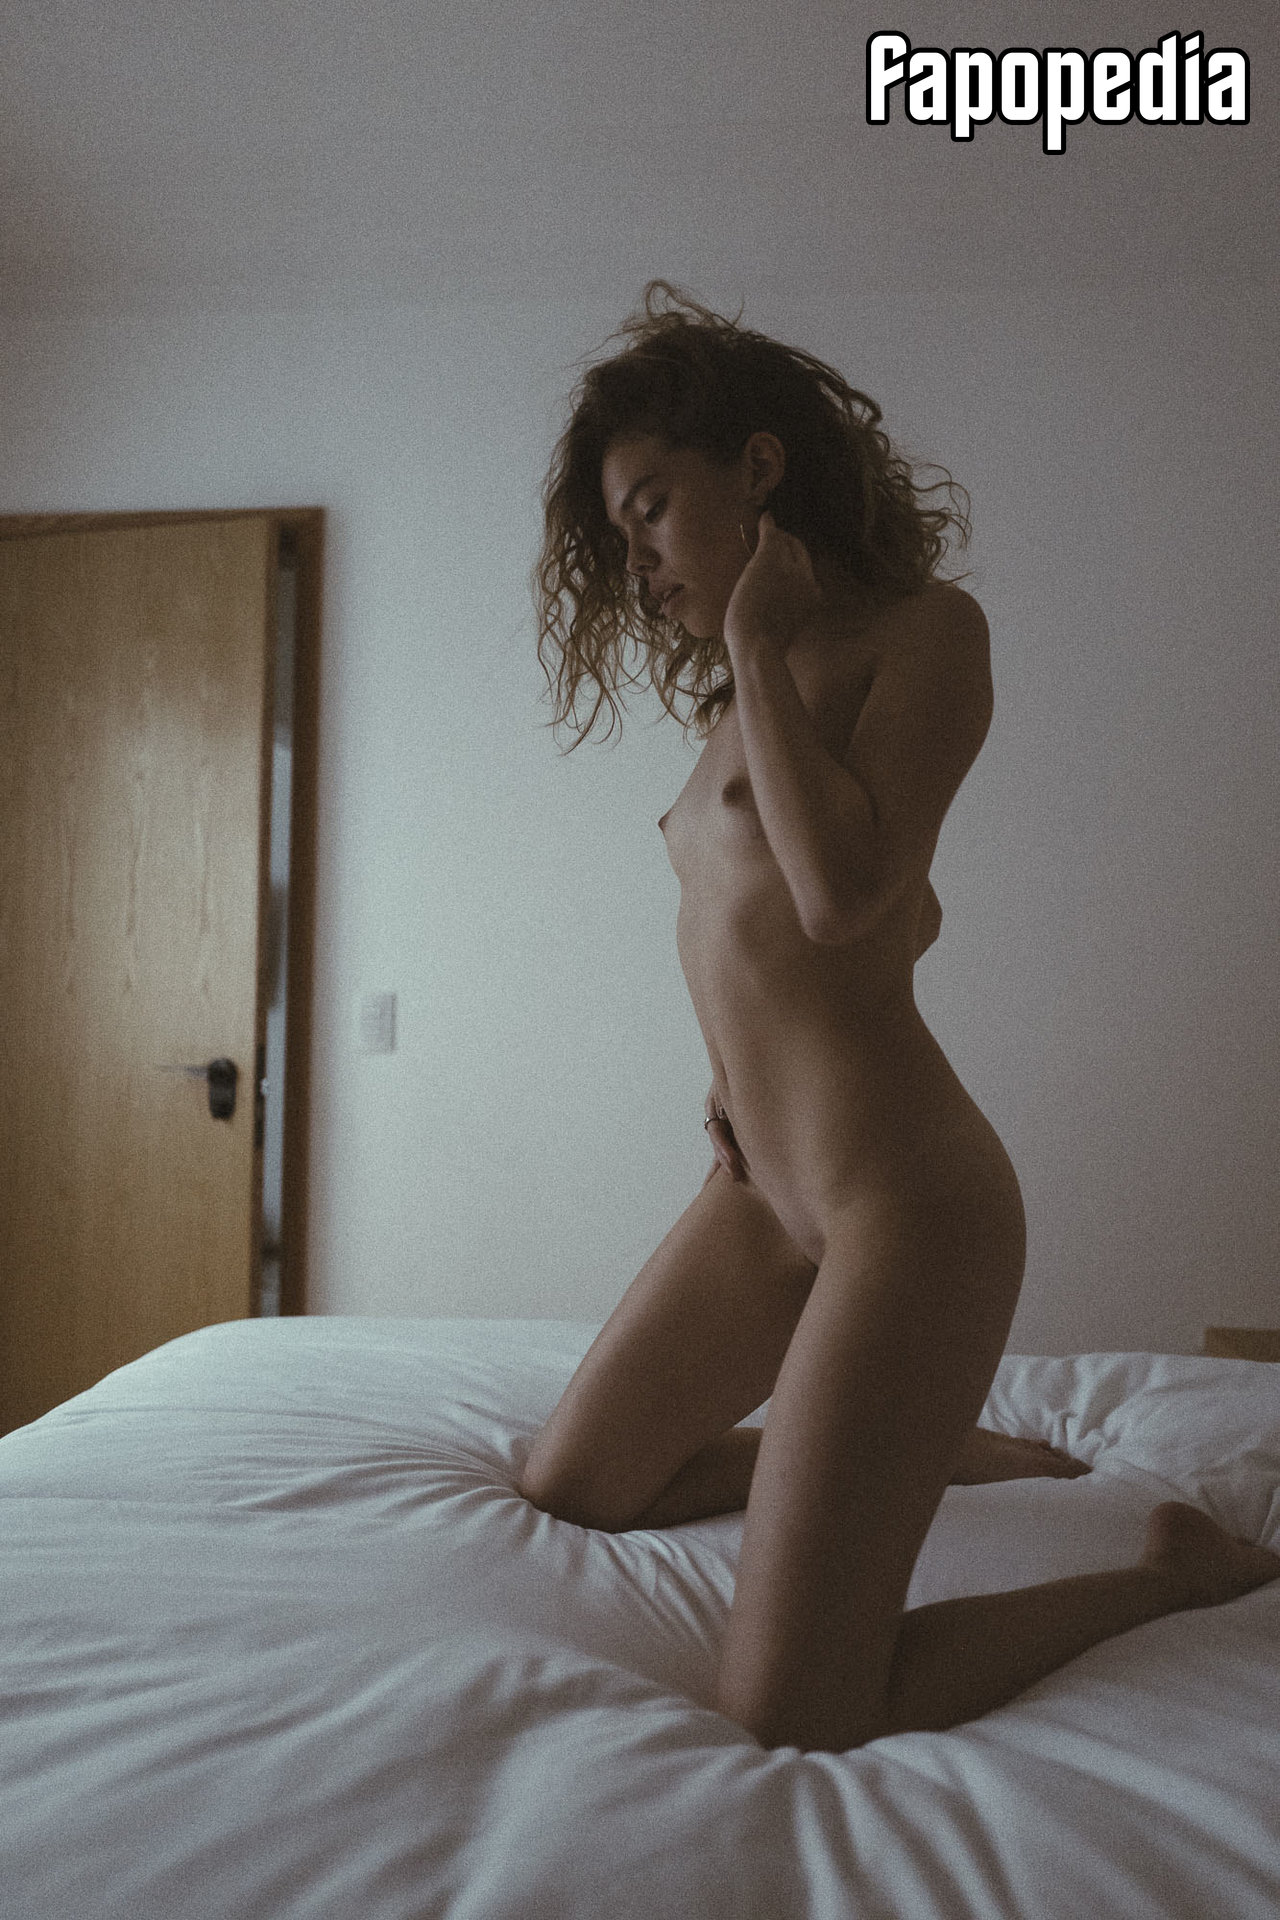 Christiane nackt Ohliger Christiane